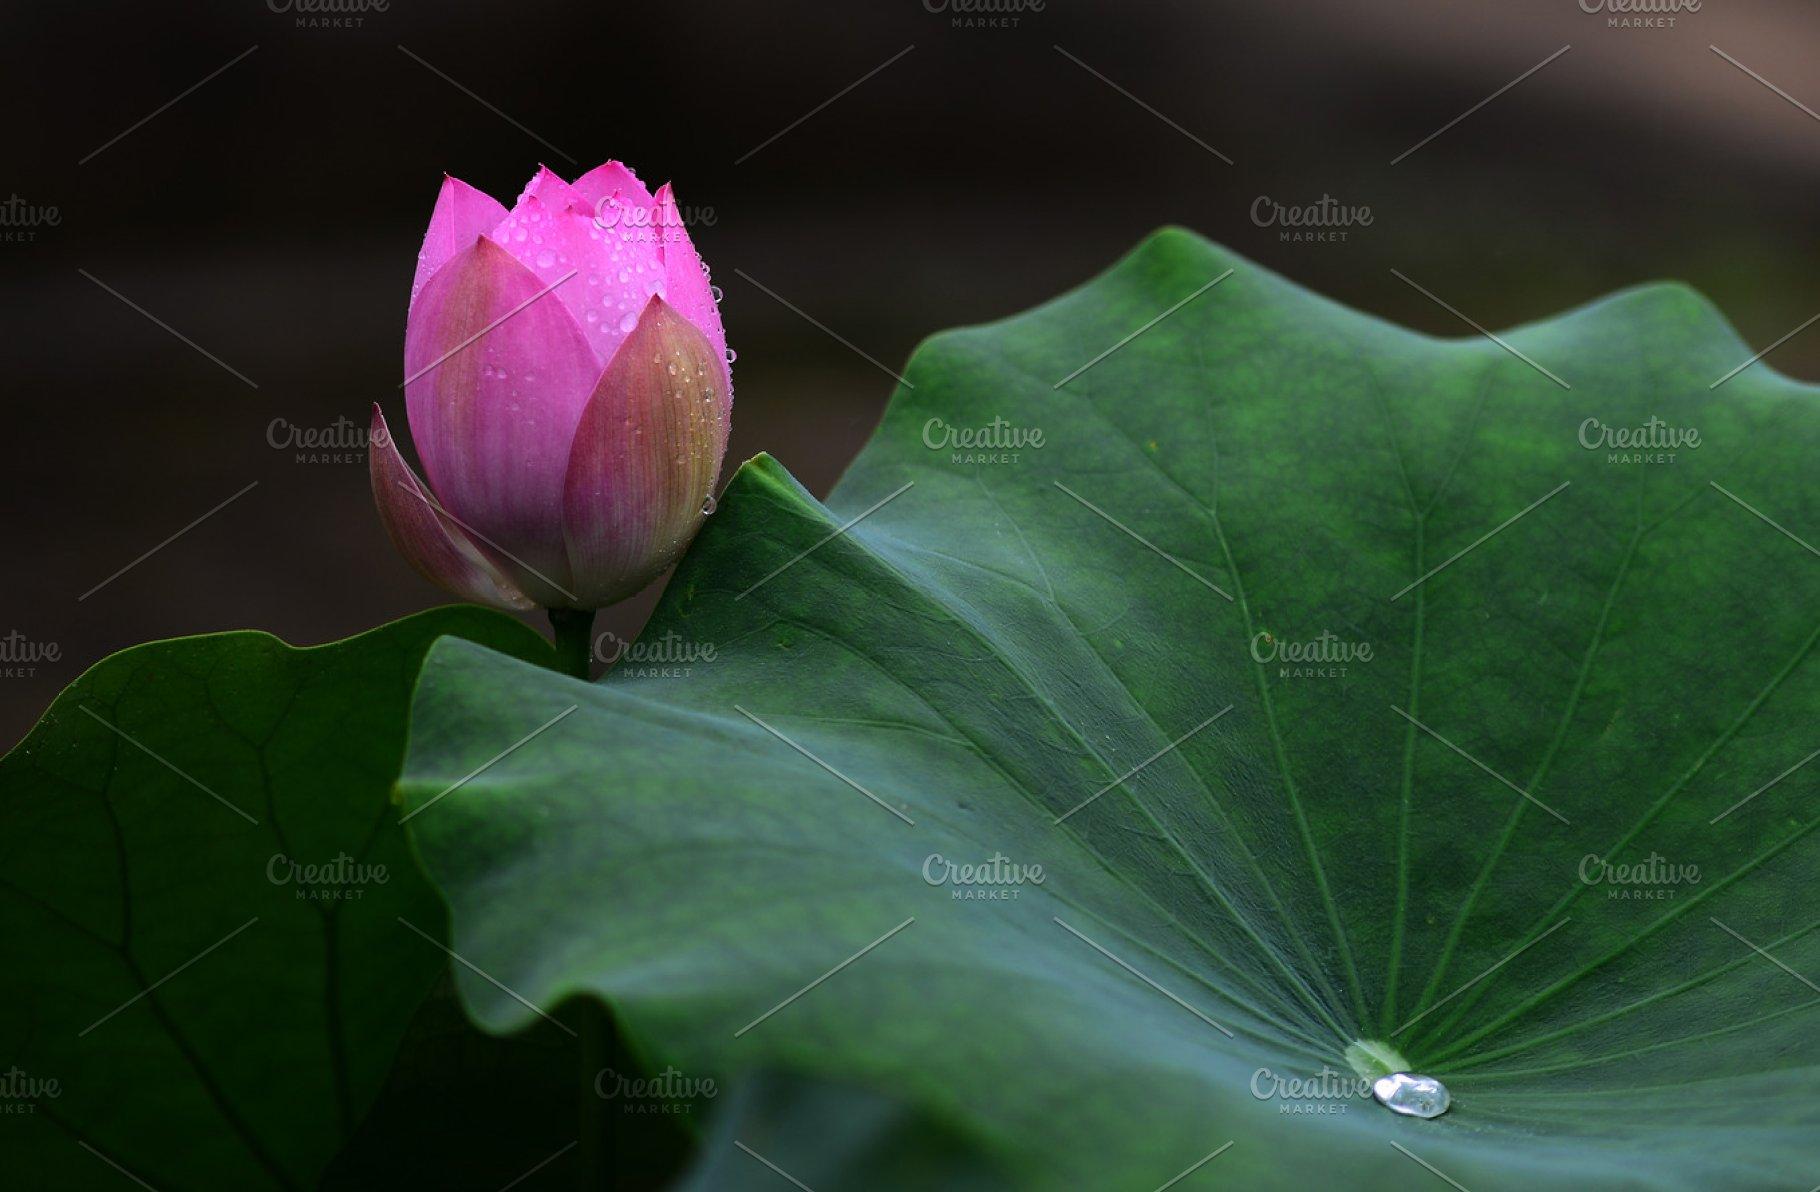 Lotus Flowers And Lotus Leaf Nature Photos Creative Market